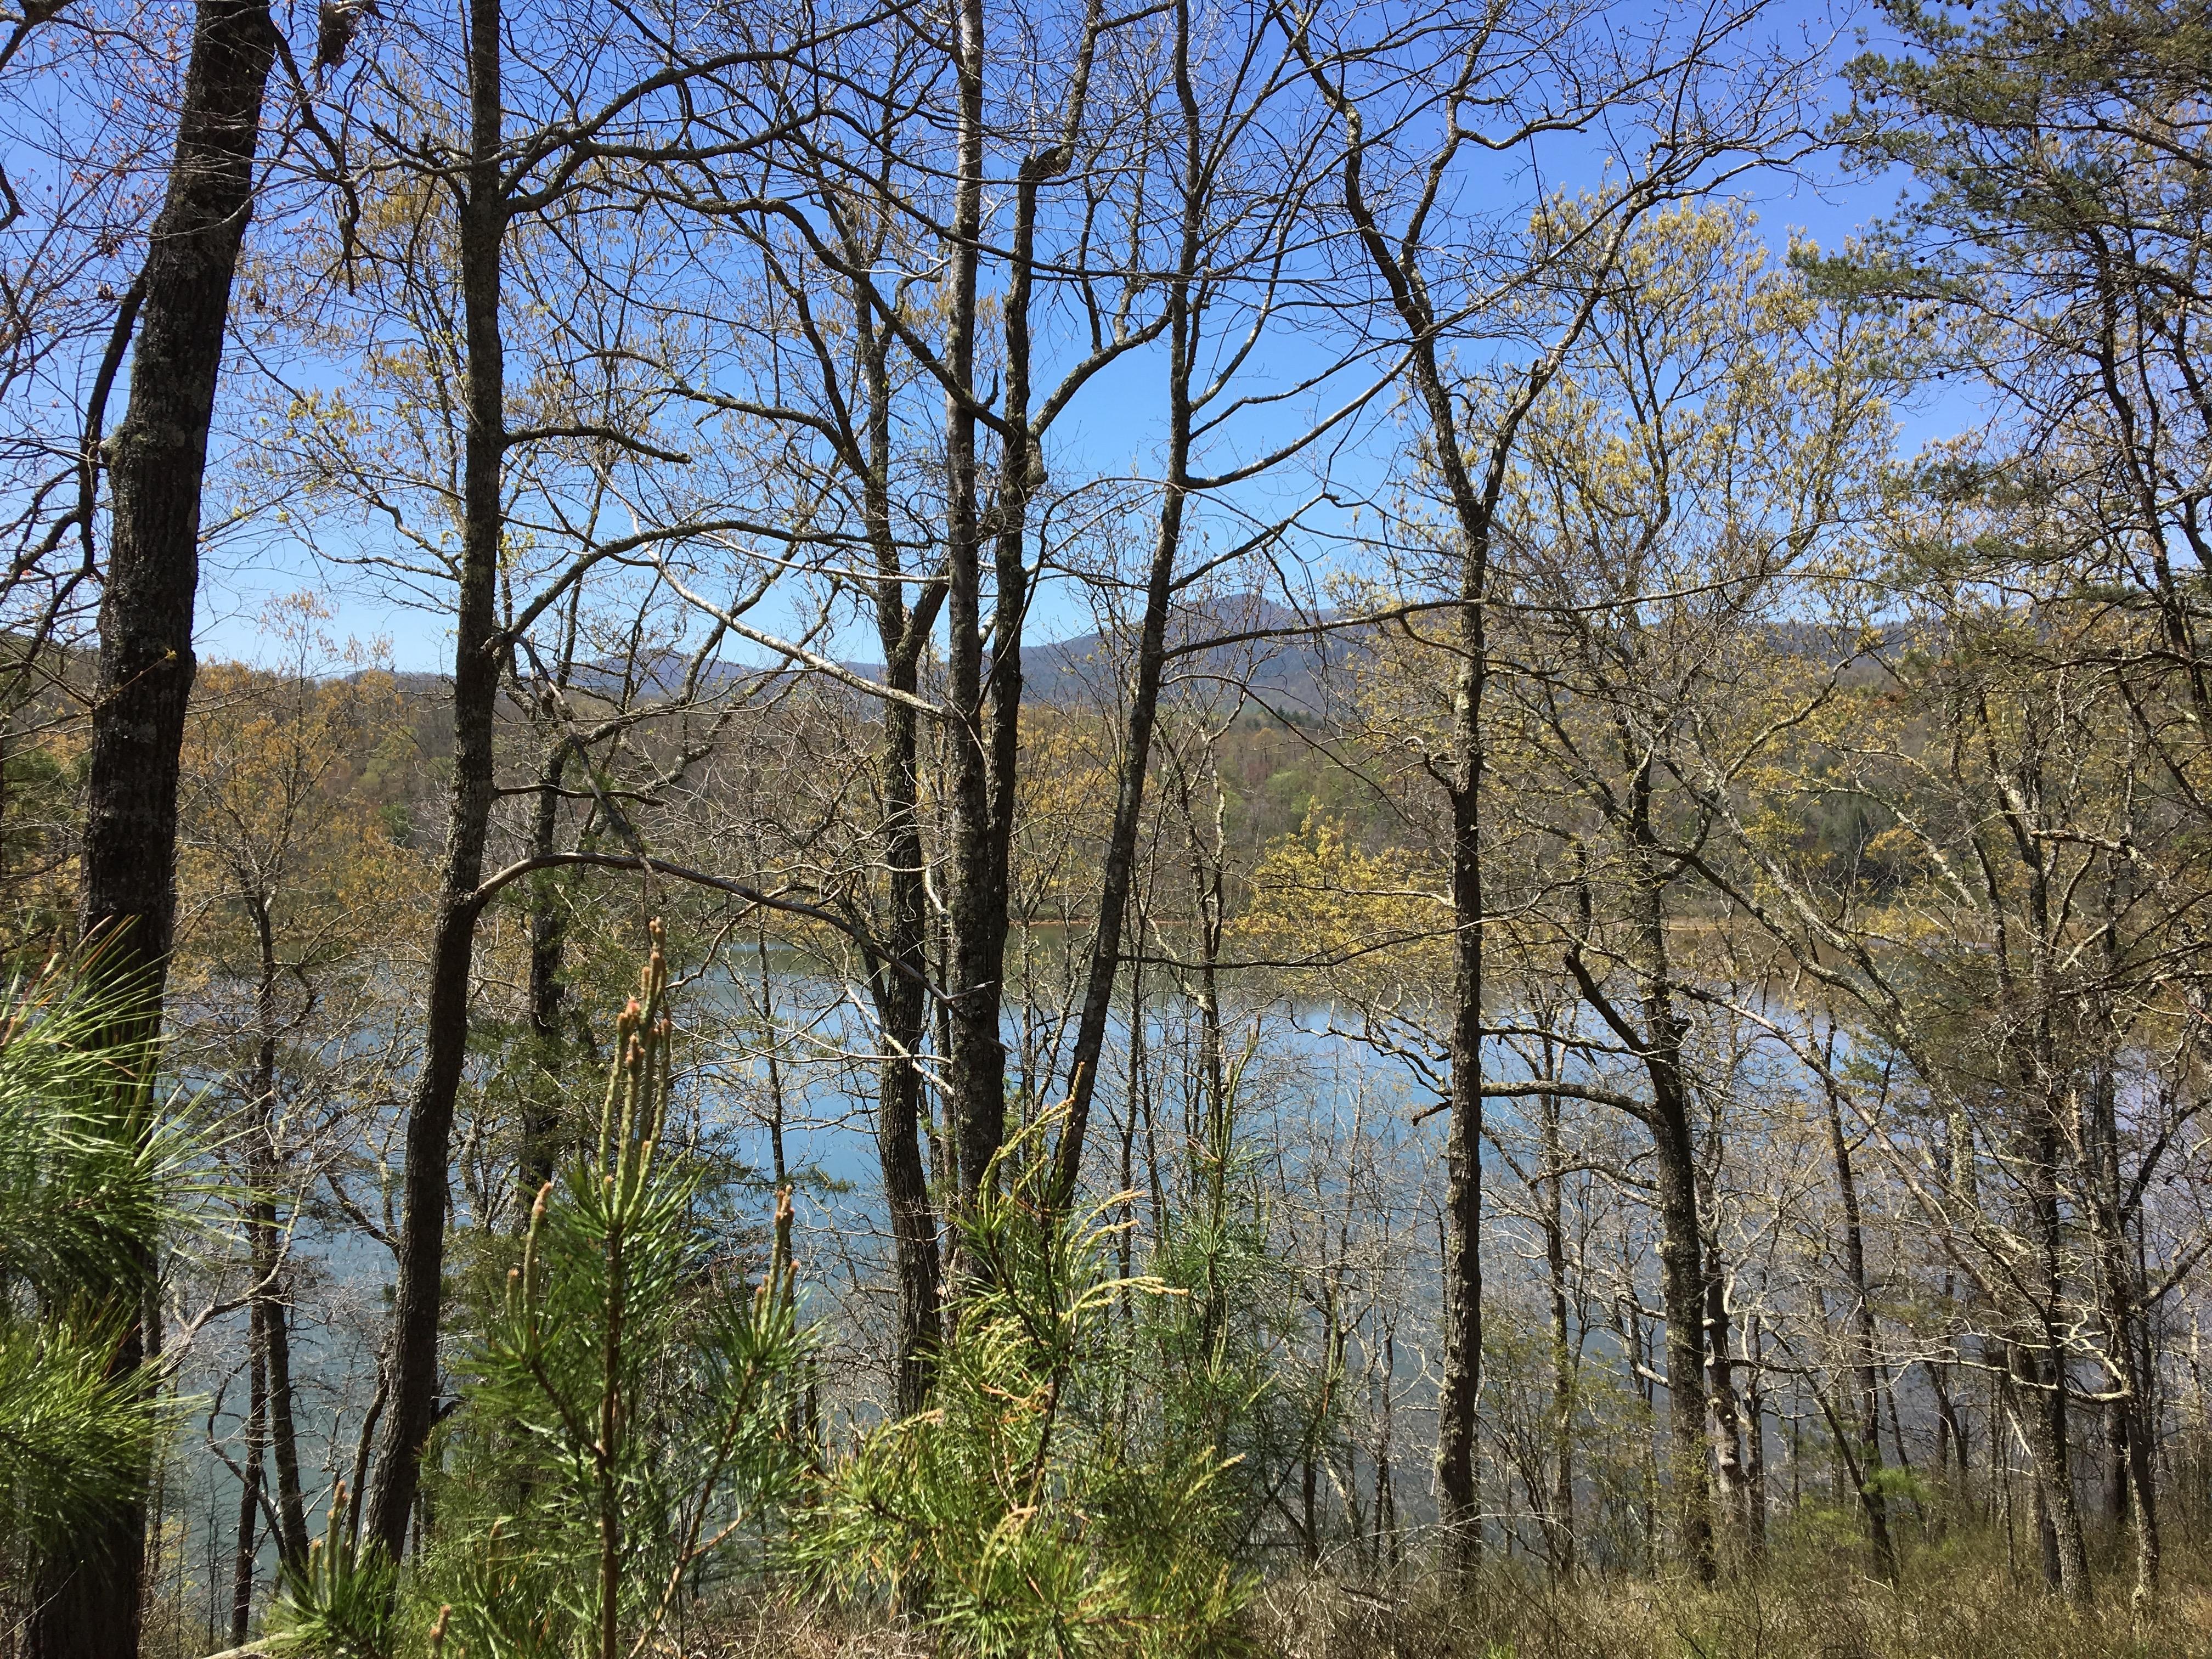 brush creek gay singles Brush creek is a singletrack mountain bike trail in ocoee, tennessee view maps, videos, photos, and reviews of brush creek bike trail in ocoee.